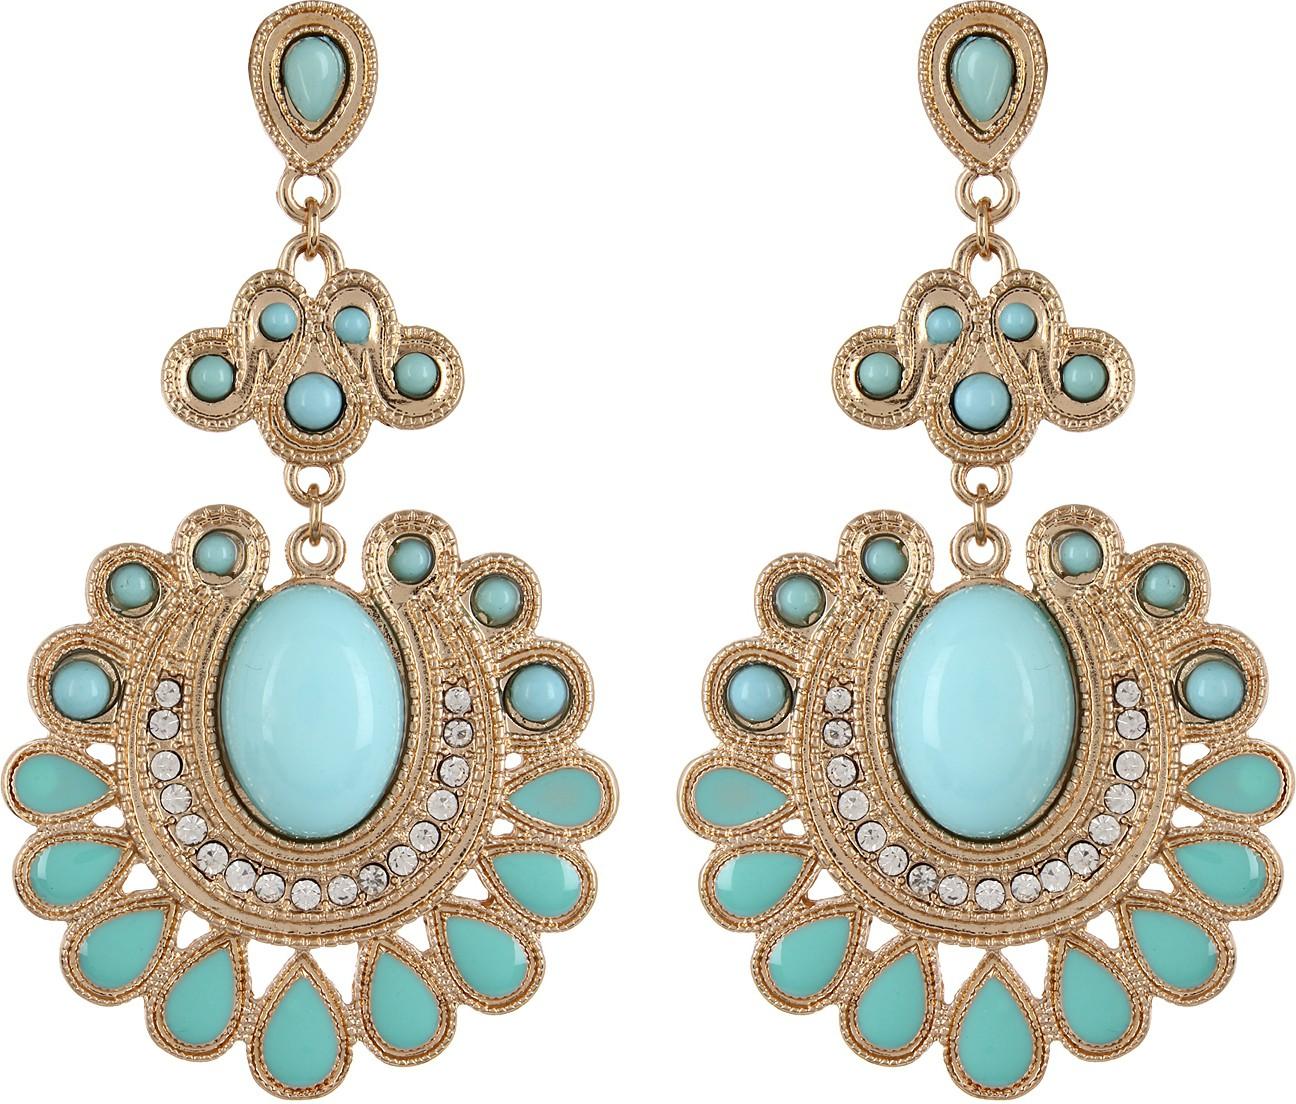 Deals - Delhi - Minimum 70% Off <br> Earrings, Pendants...<br> Category - jewellery<br> Business - Flipkart.com